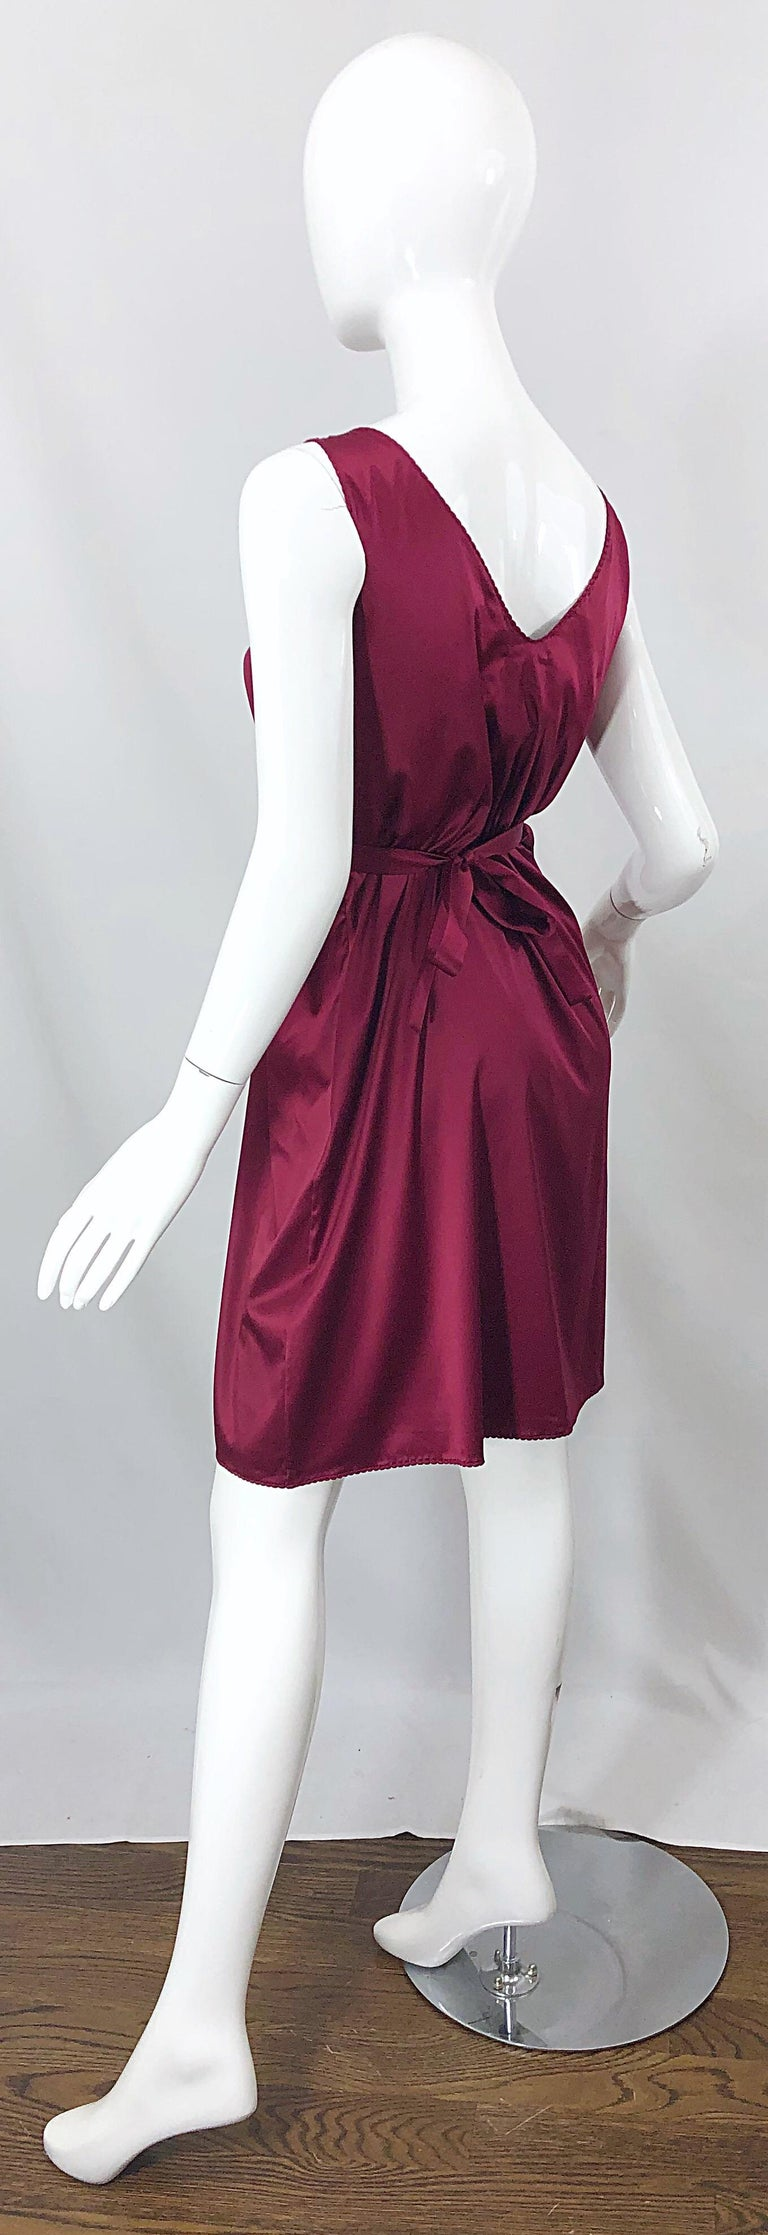 2000s John Galliano Sz 42 (US 6 / 8) Burgundy Silk Feather Brooch Babydoll Dress For Sale 9